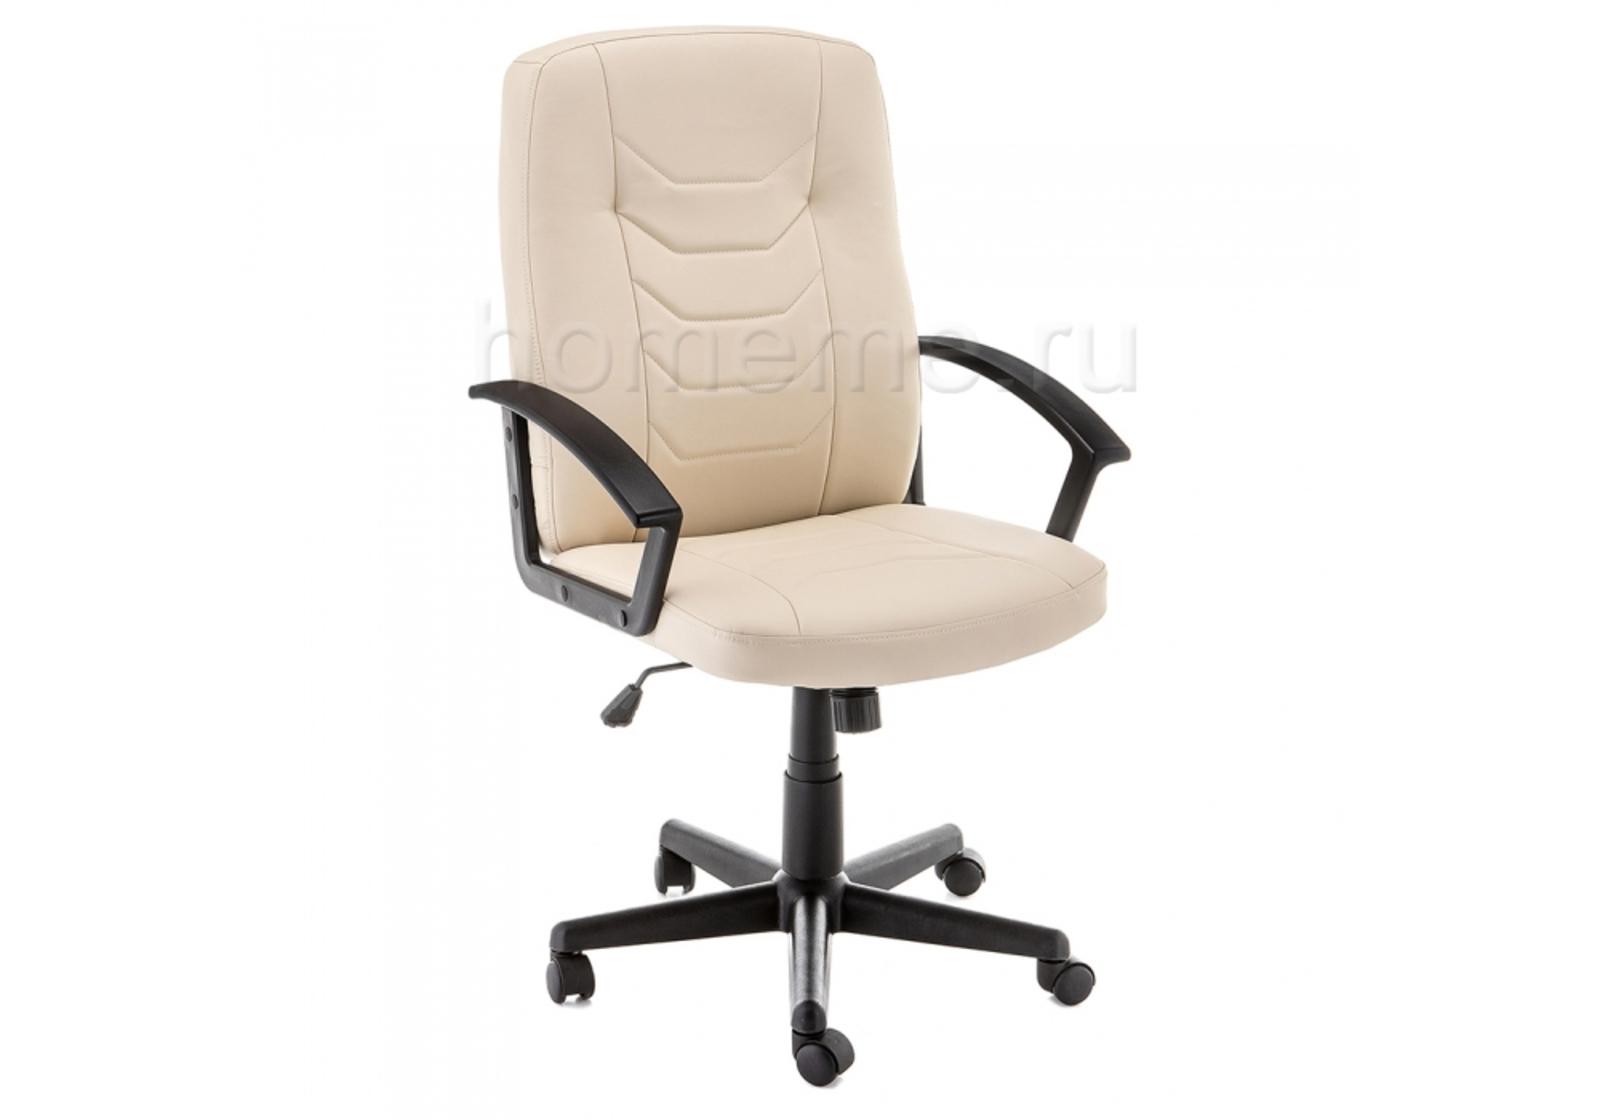 Кресло для офиса HomeMe Darin Ivory 11265 от Homeme.ru